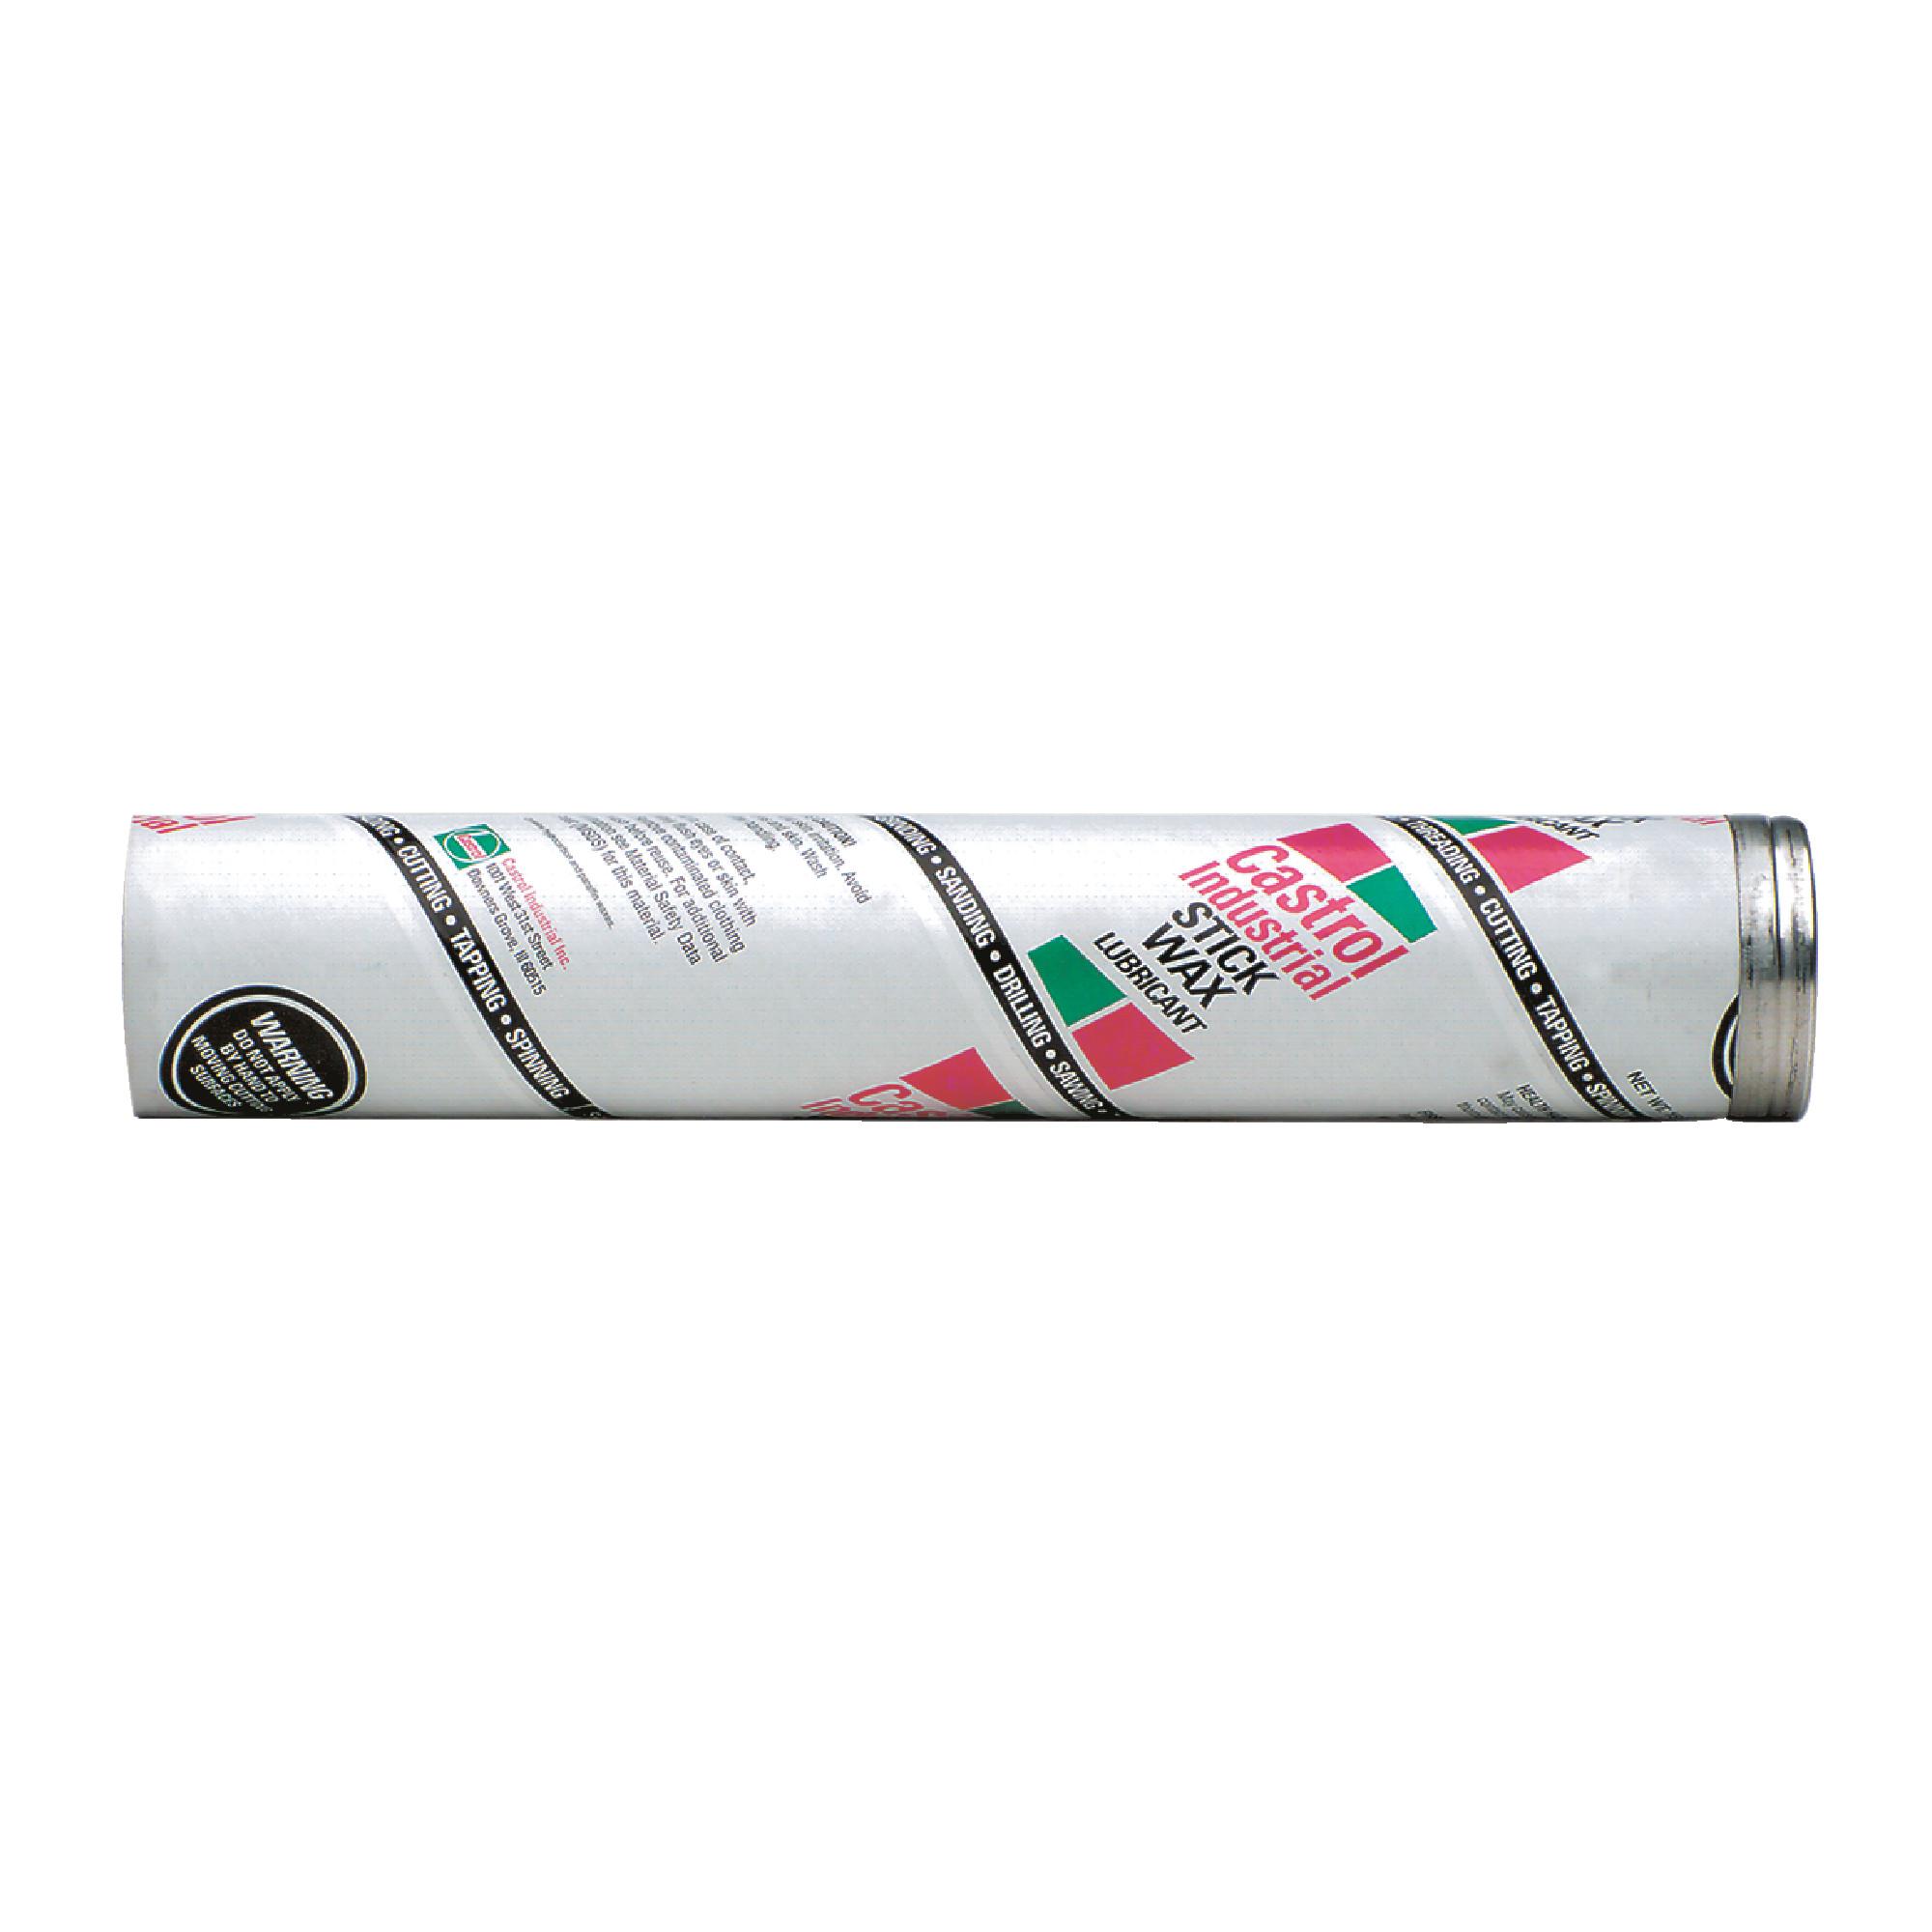 140 Stick-Wax Metal Working Lubricant